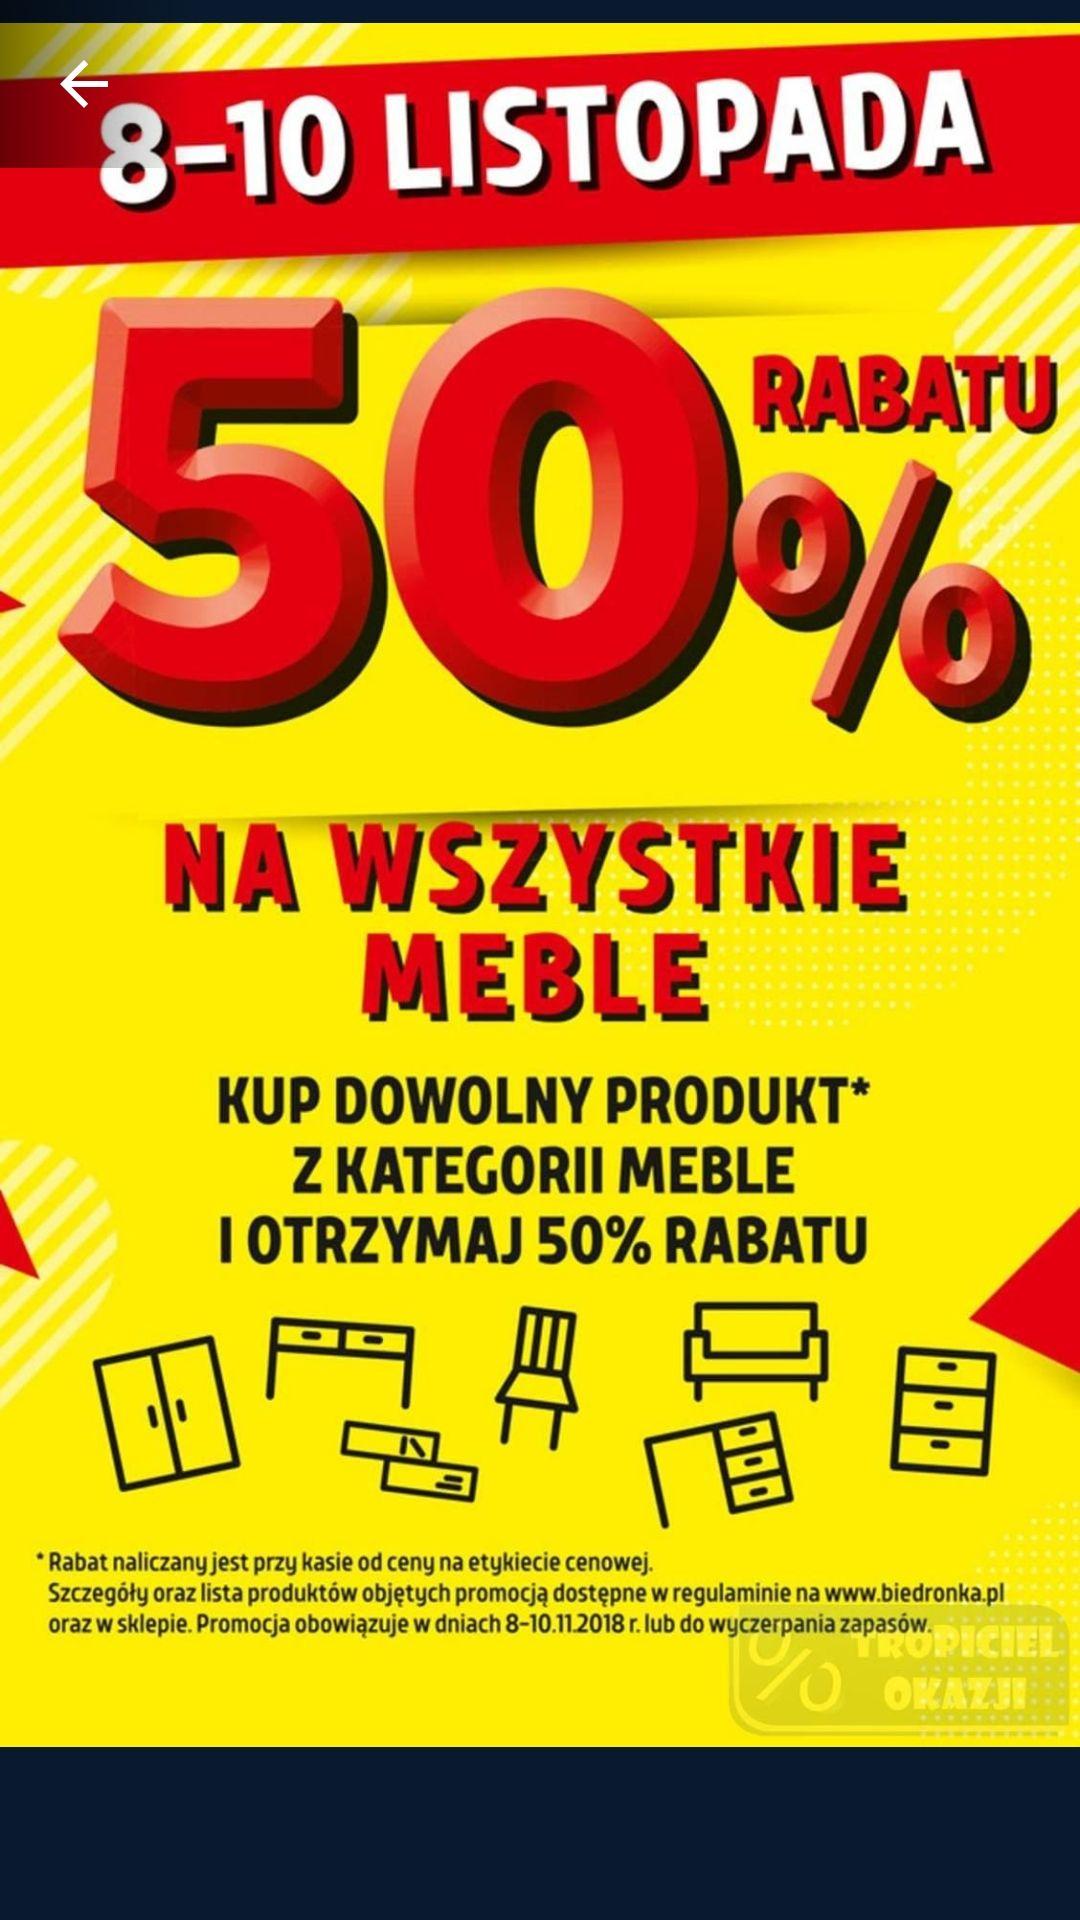 Biedronka -50% na meble